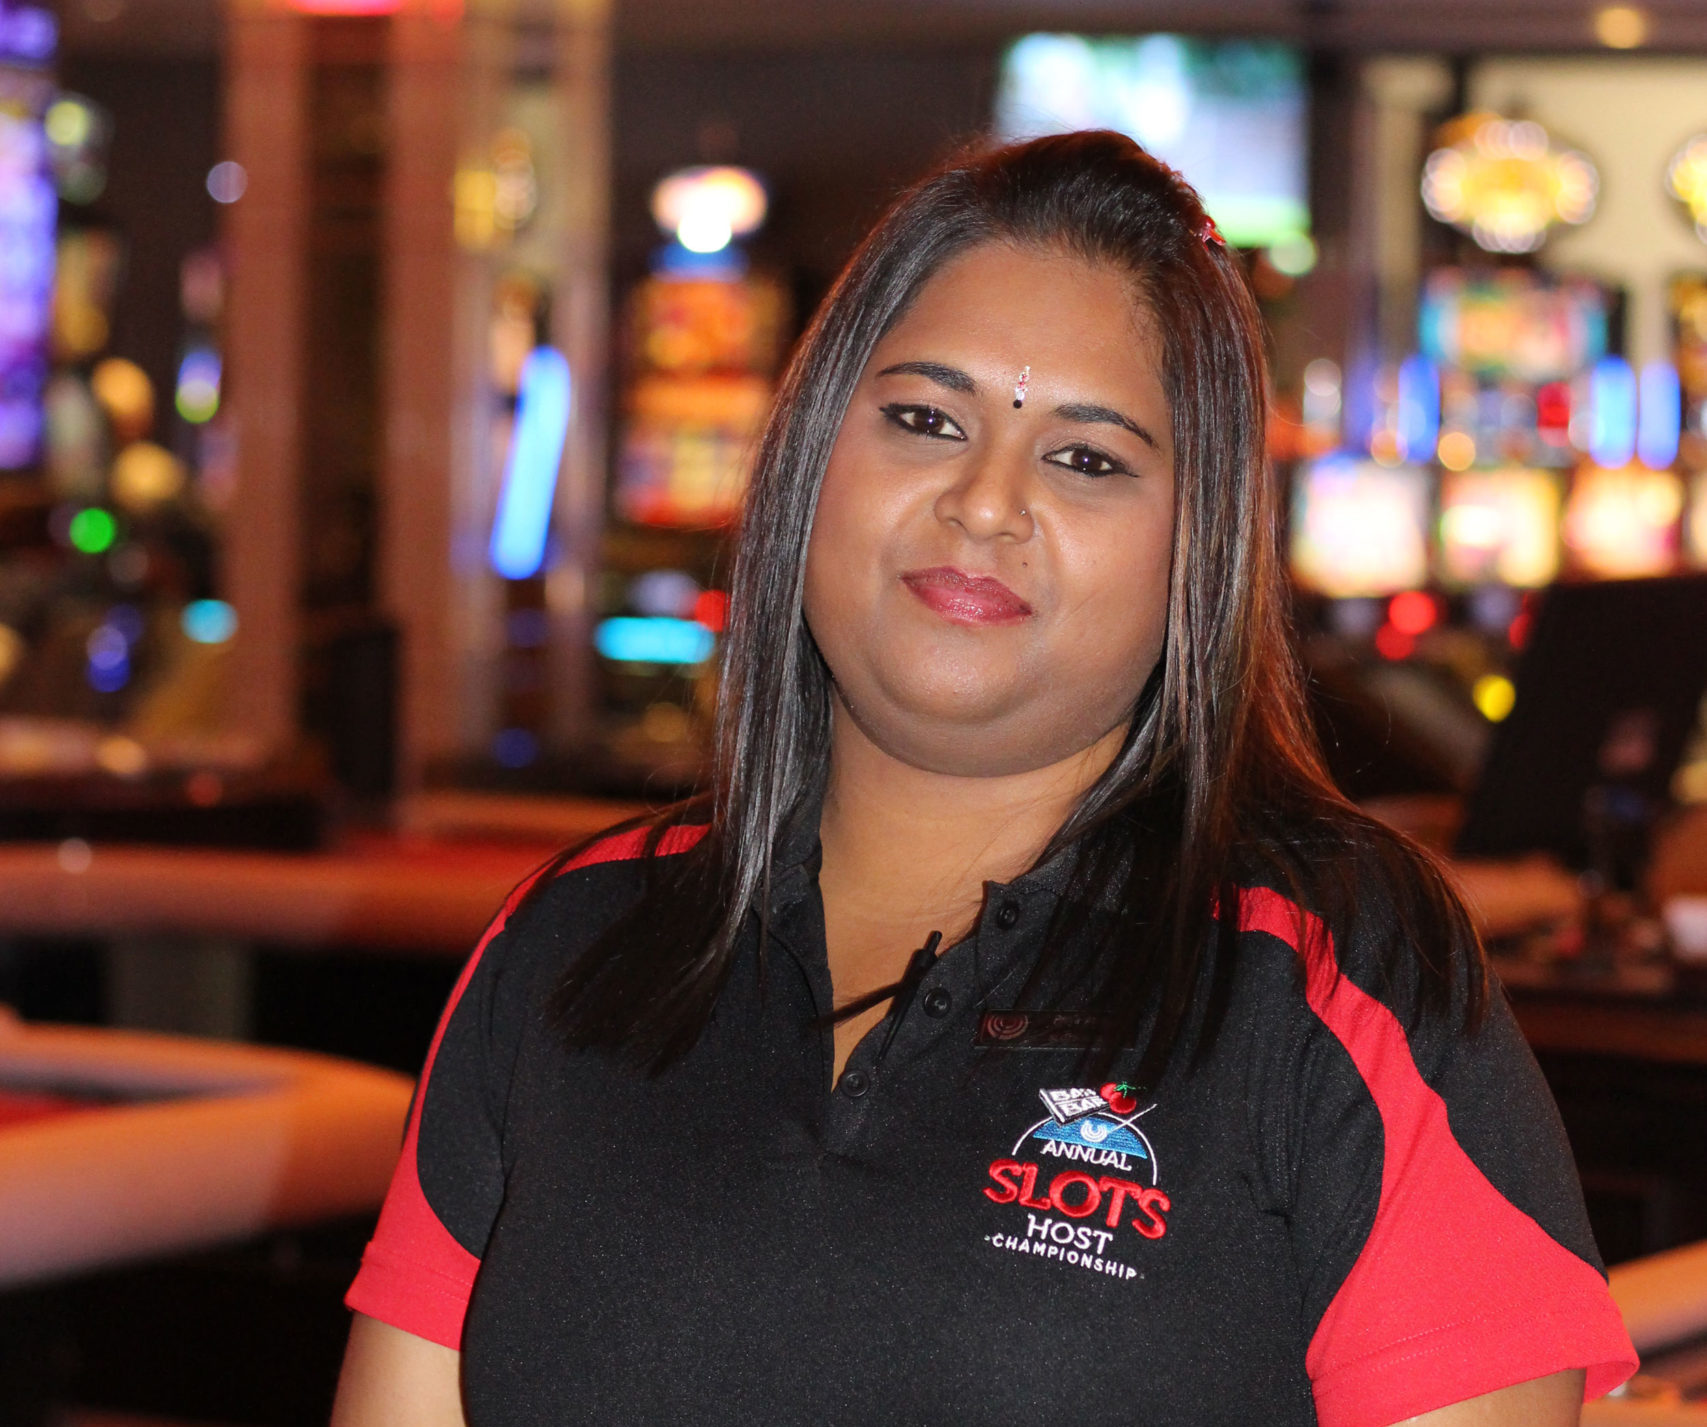 Suncoast casino Slots Host Championship 2017